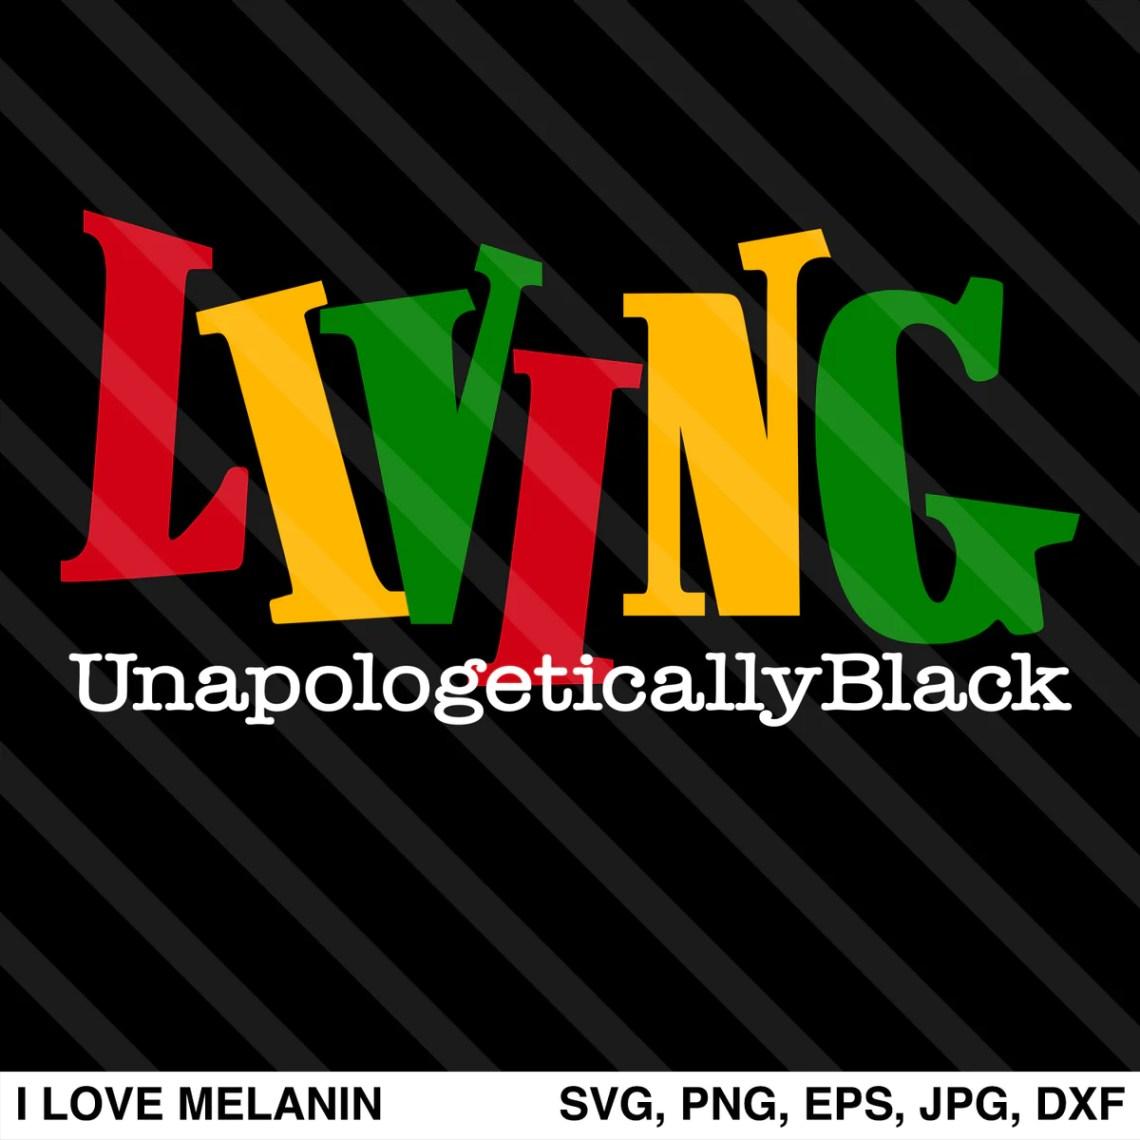 Download Living Unapologetically Black SVG - I Love Melanin